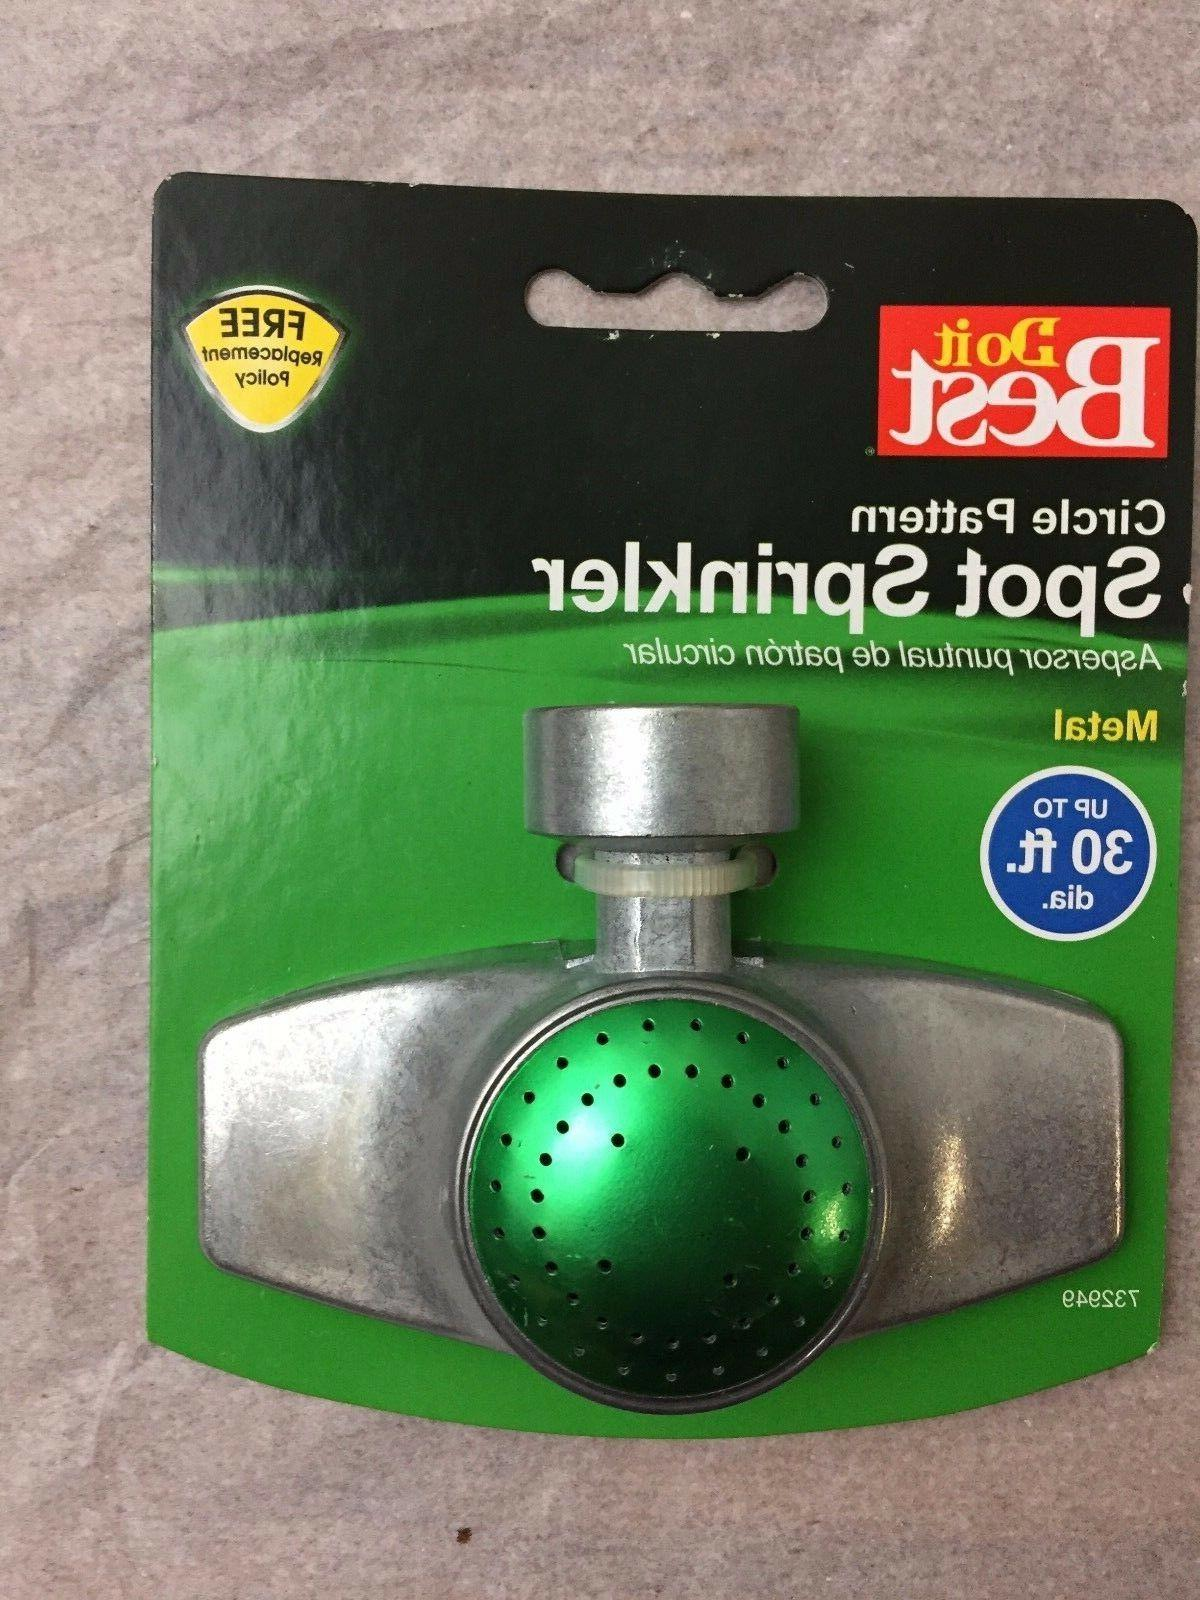 Metal Circular Spot Sprinkler 732949 by Fiskars